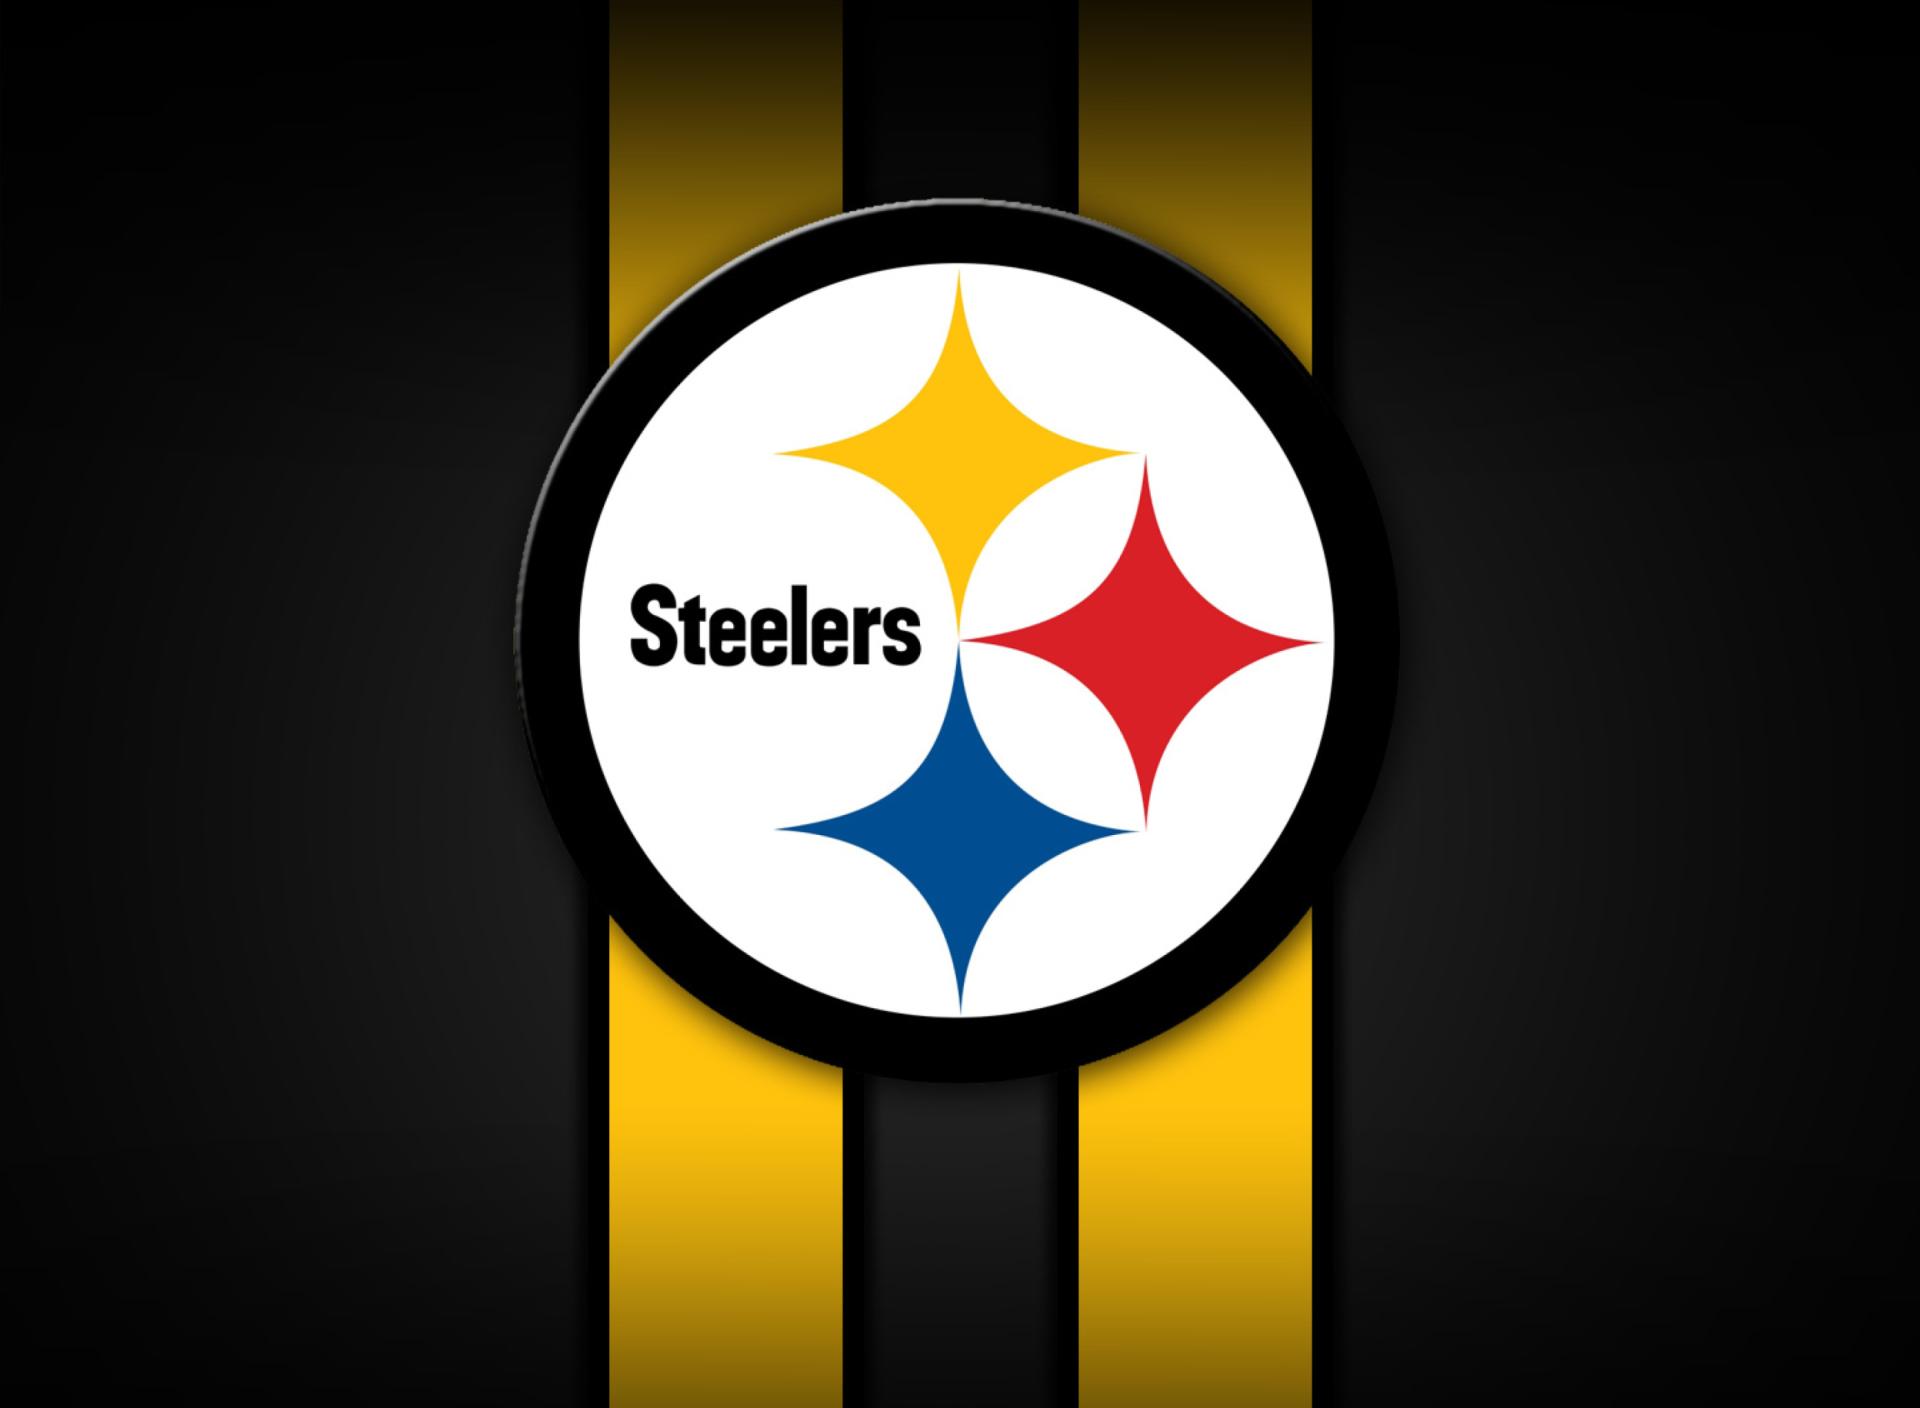 156398 скачать обои Спорт, Pittsburgh Steelers, Американский Футбол, Логотип - заставки и картинки бесплатно